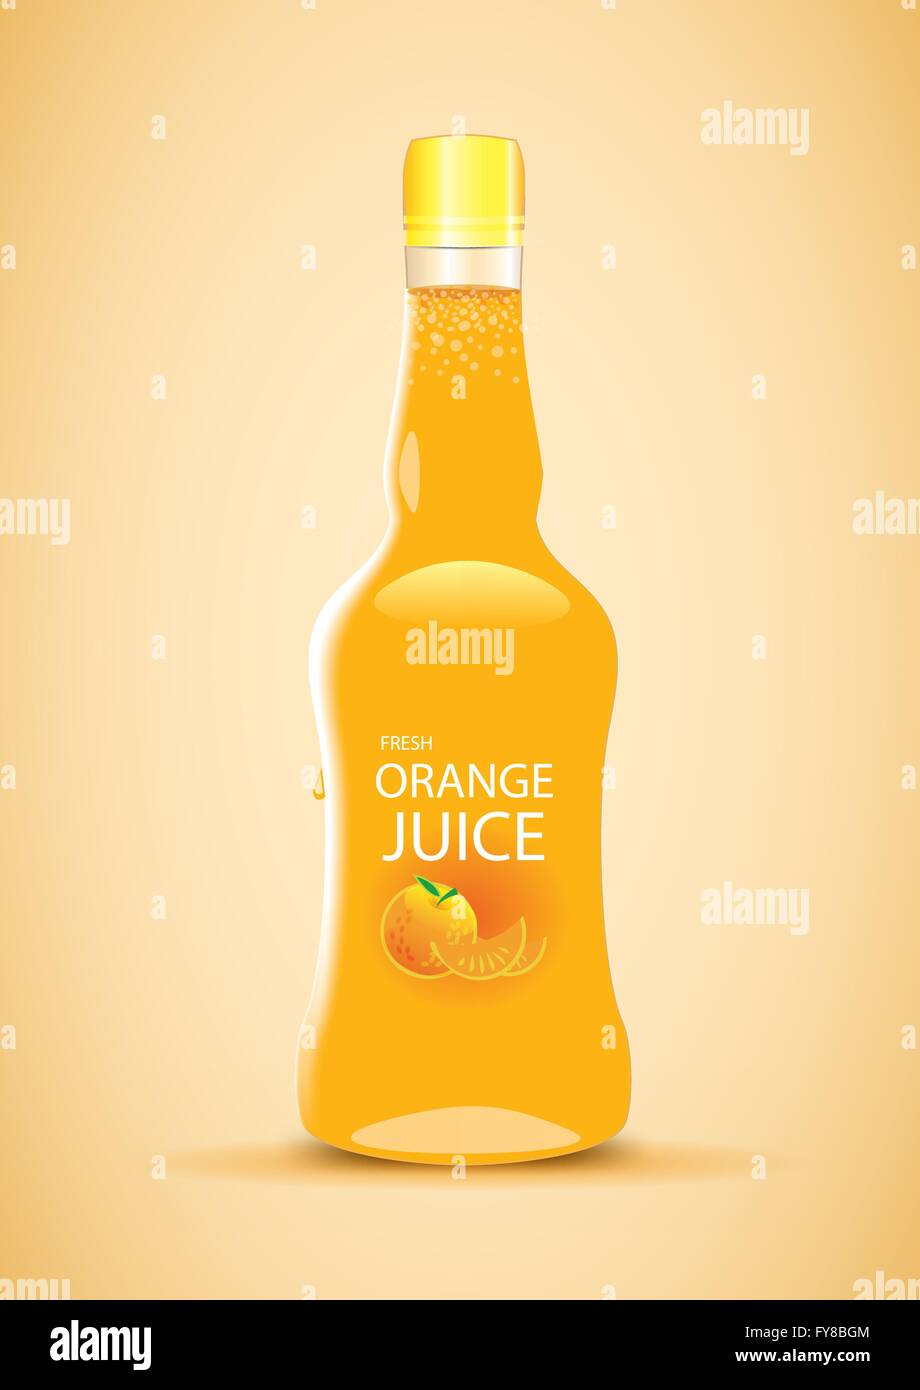 Summer Juice Drink - Stock Image